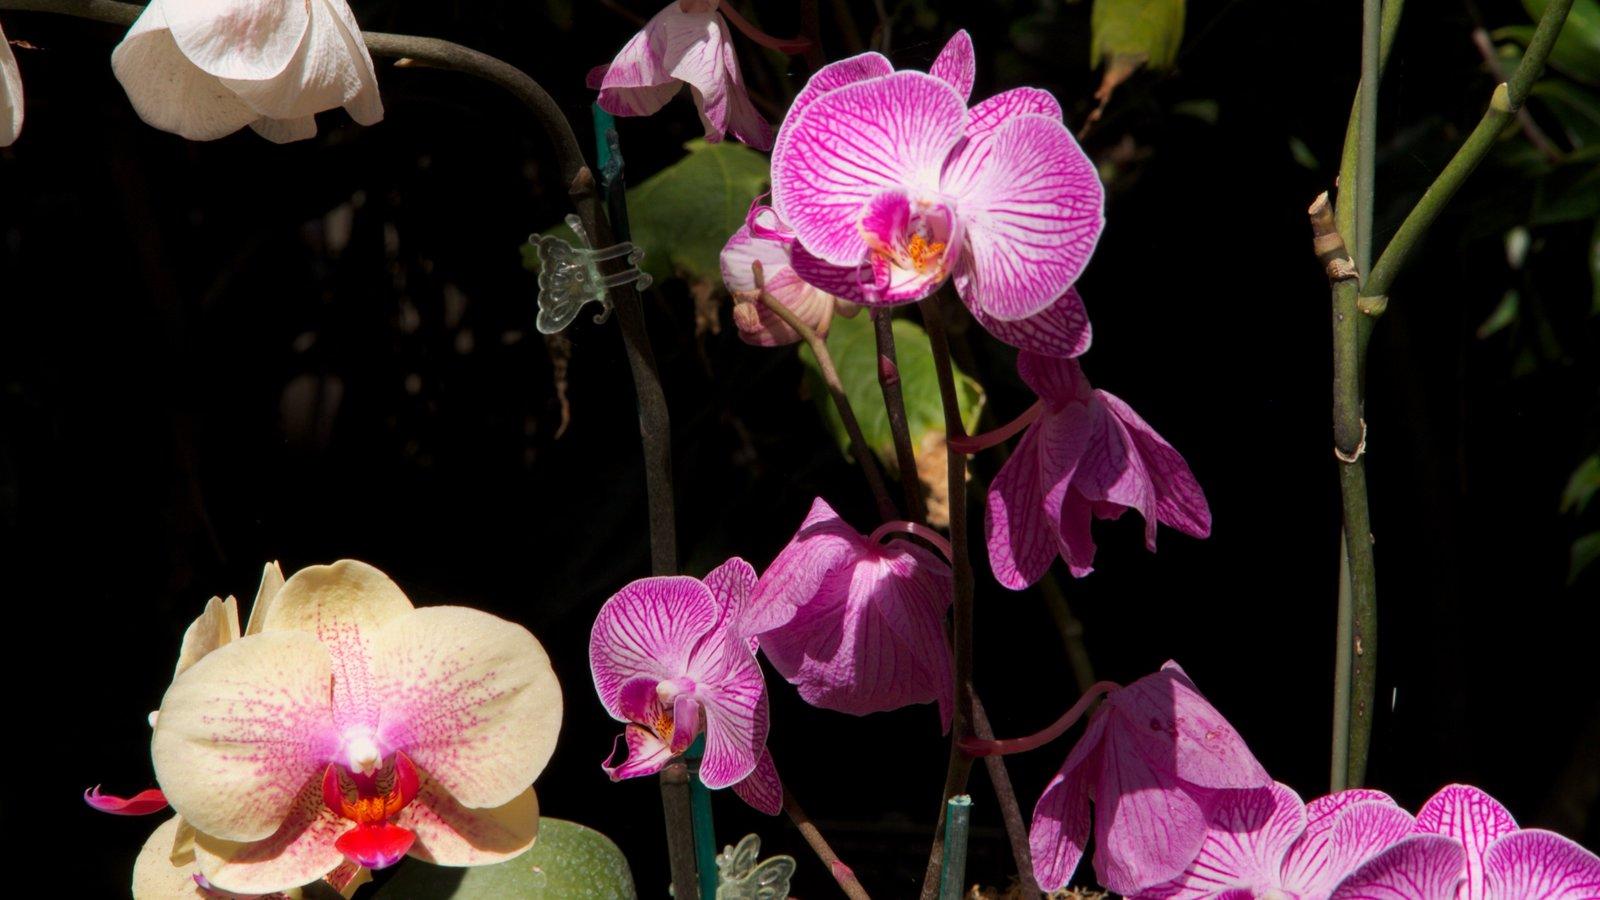 San Diego mostrando flores silvestres